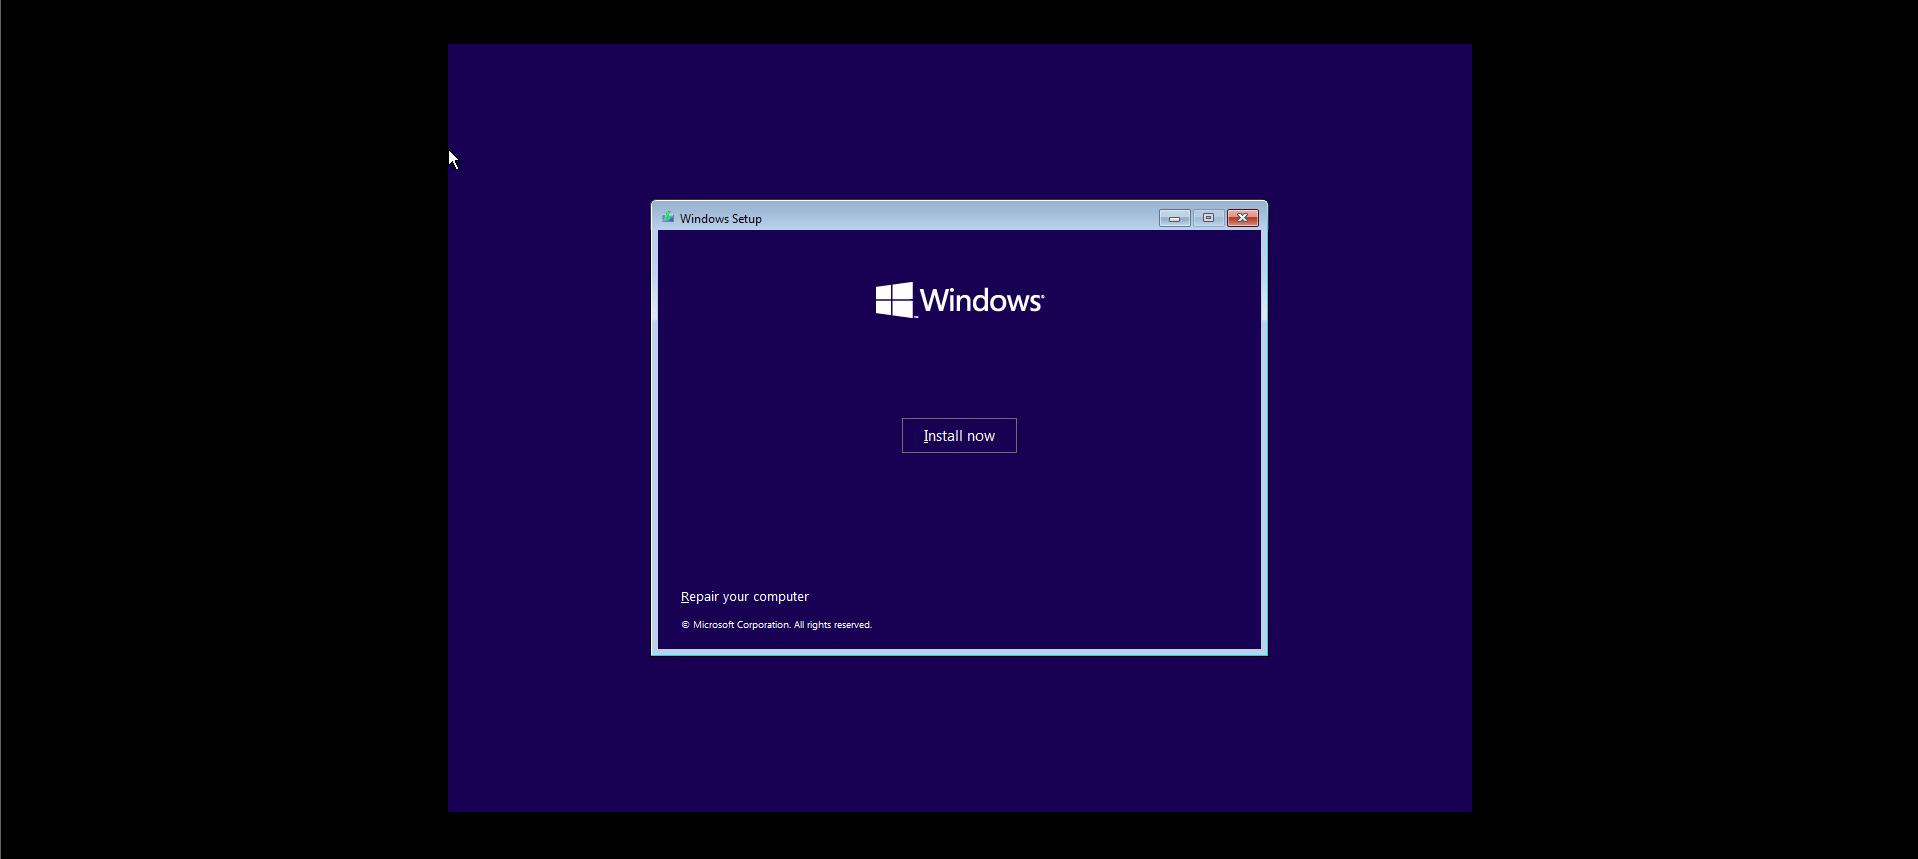 Windows 10 Install Now Button